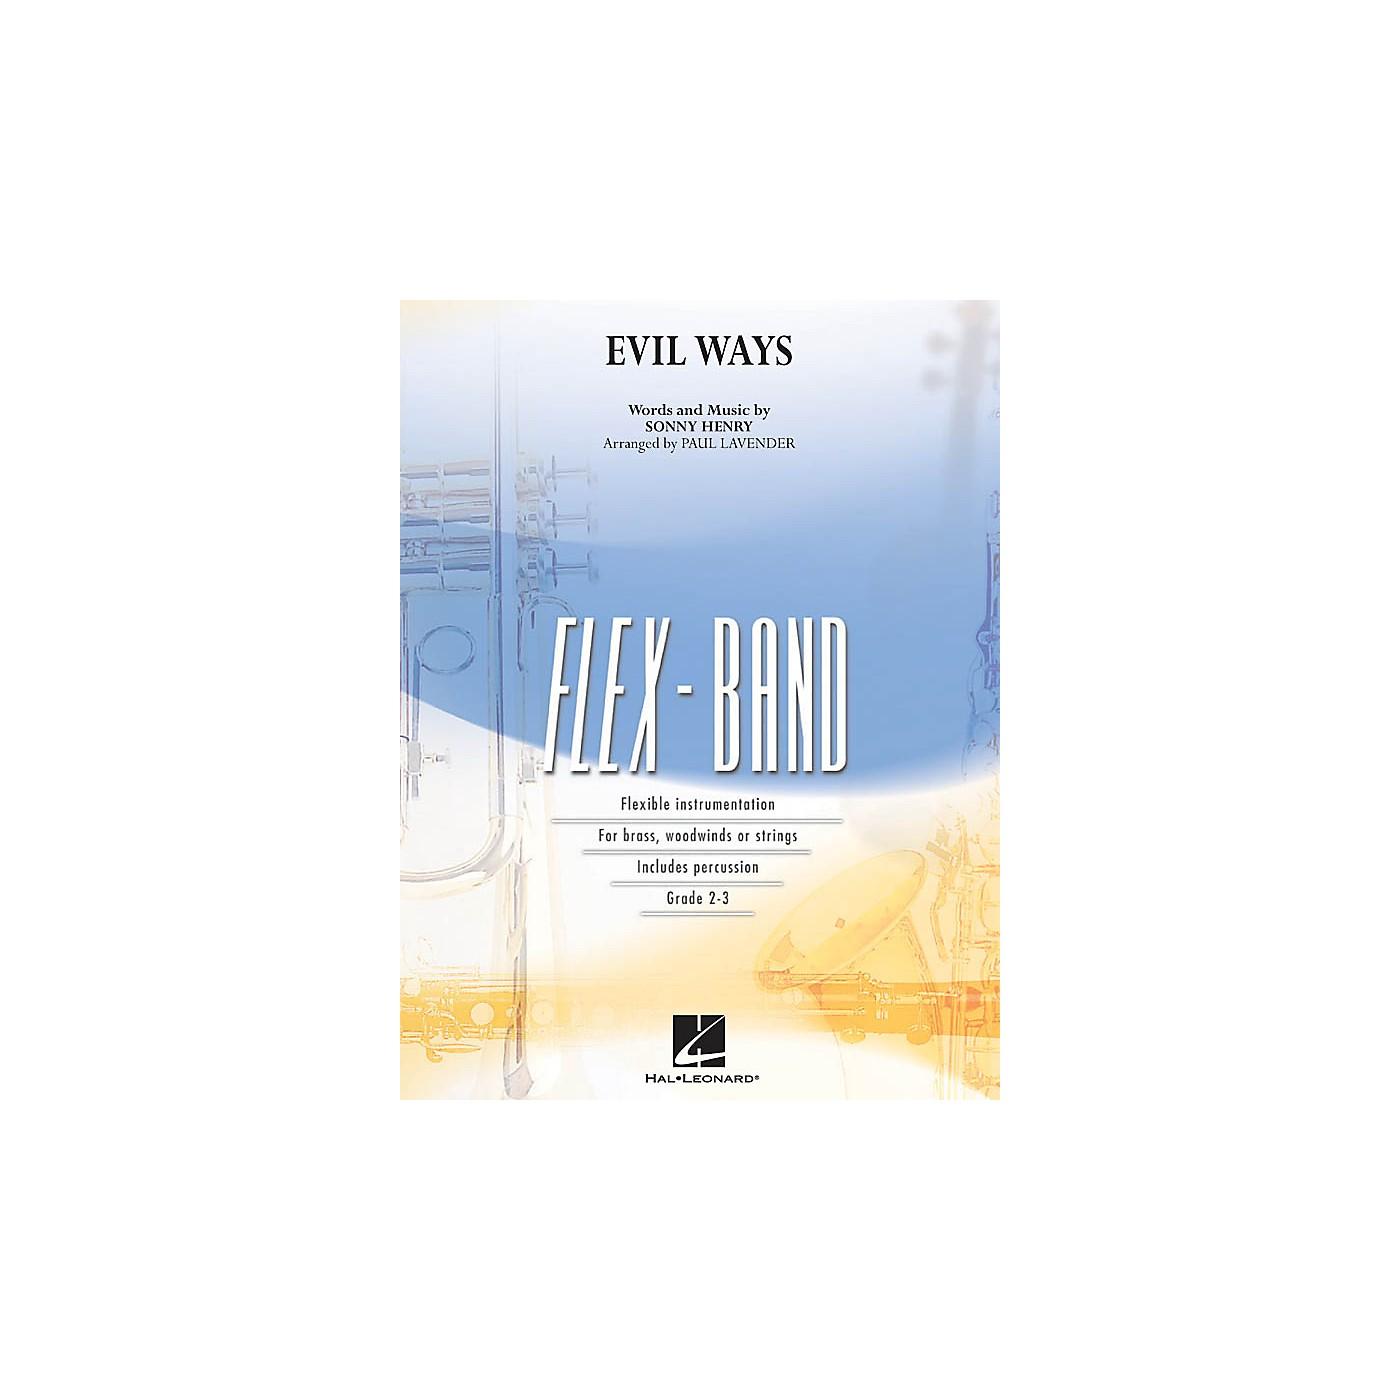 Hal Leonard Evil Ways Concert Band Level 2-3 Arranged by Paul Lavender thumbnail